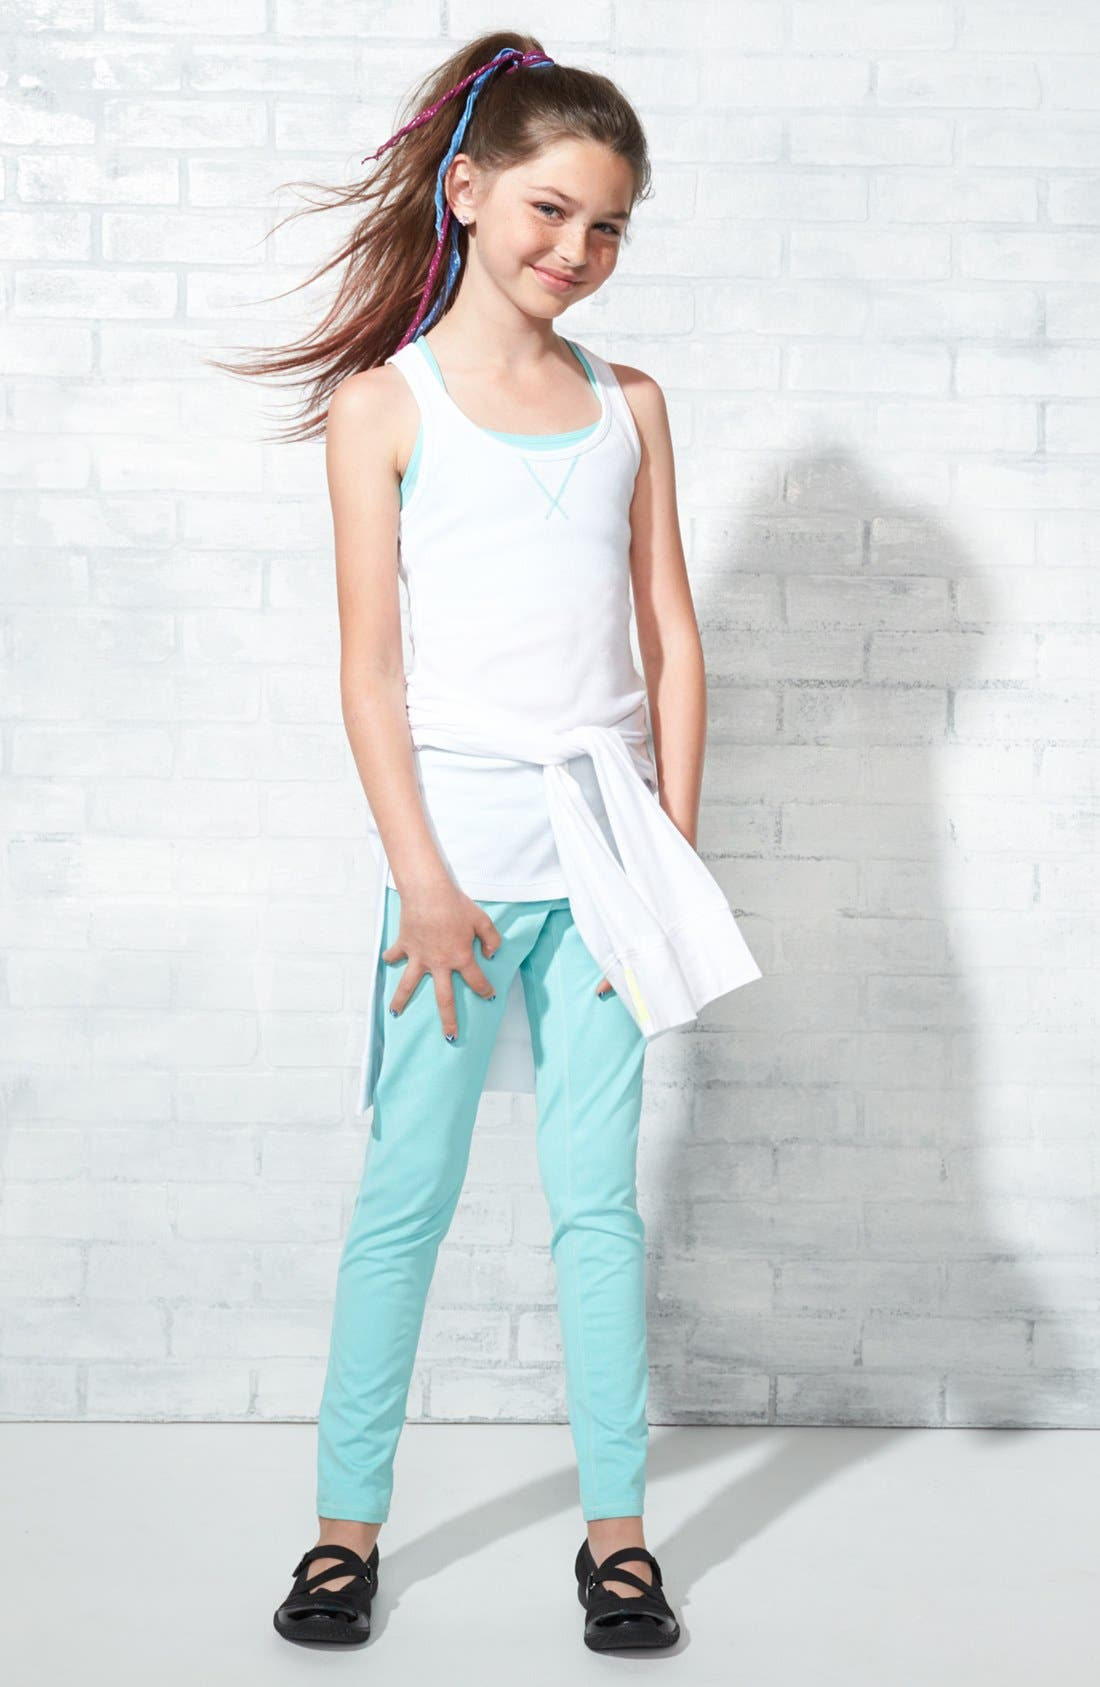 Alternate Image 2  - Zella Girl 'Sporty' Hooded Tunic Tee (Little Girls & Big Girls)